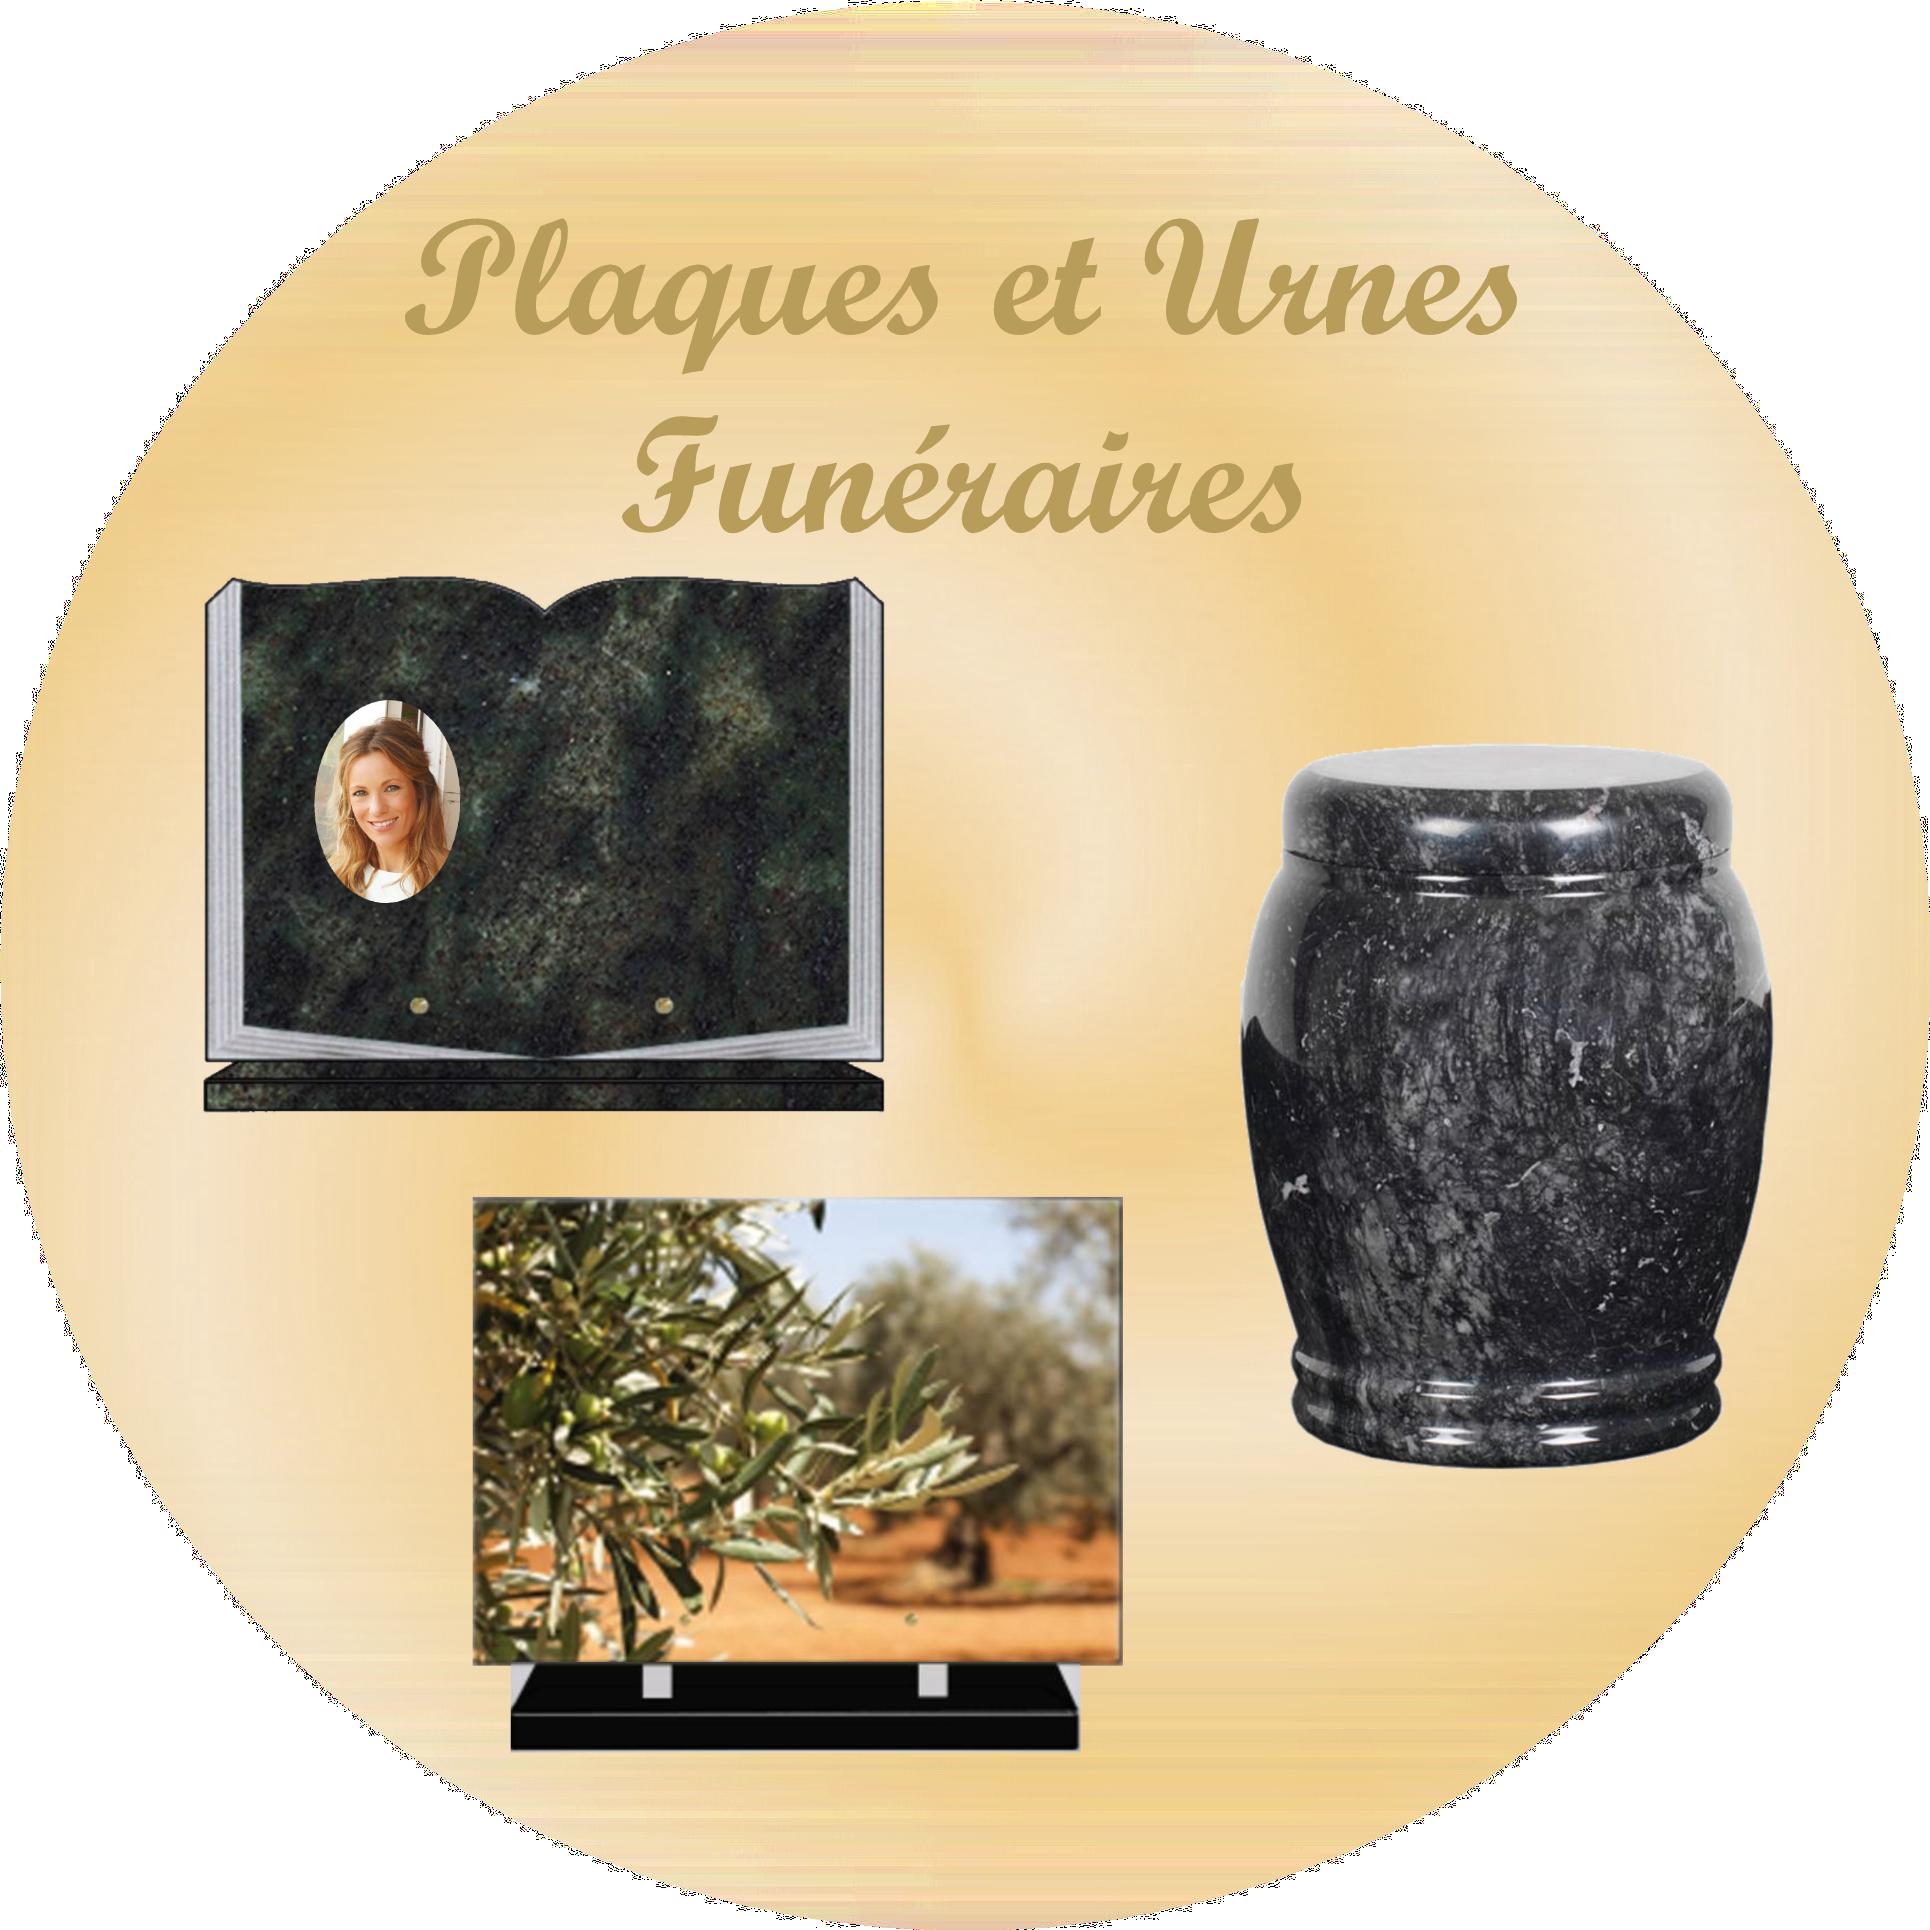 plaques et urnes funéraires MORBIHAN 56